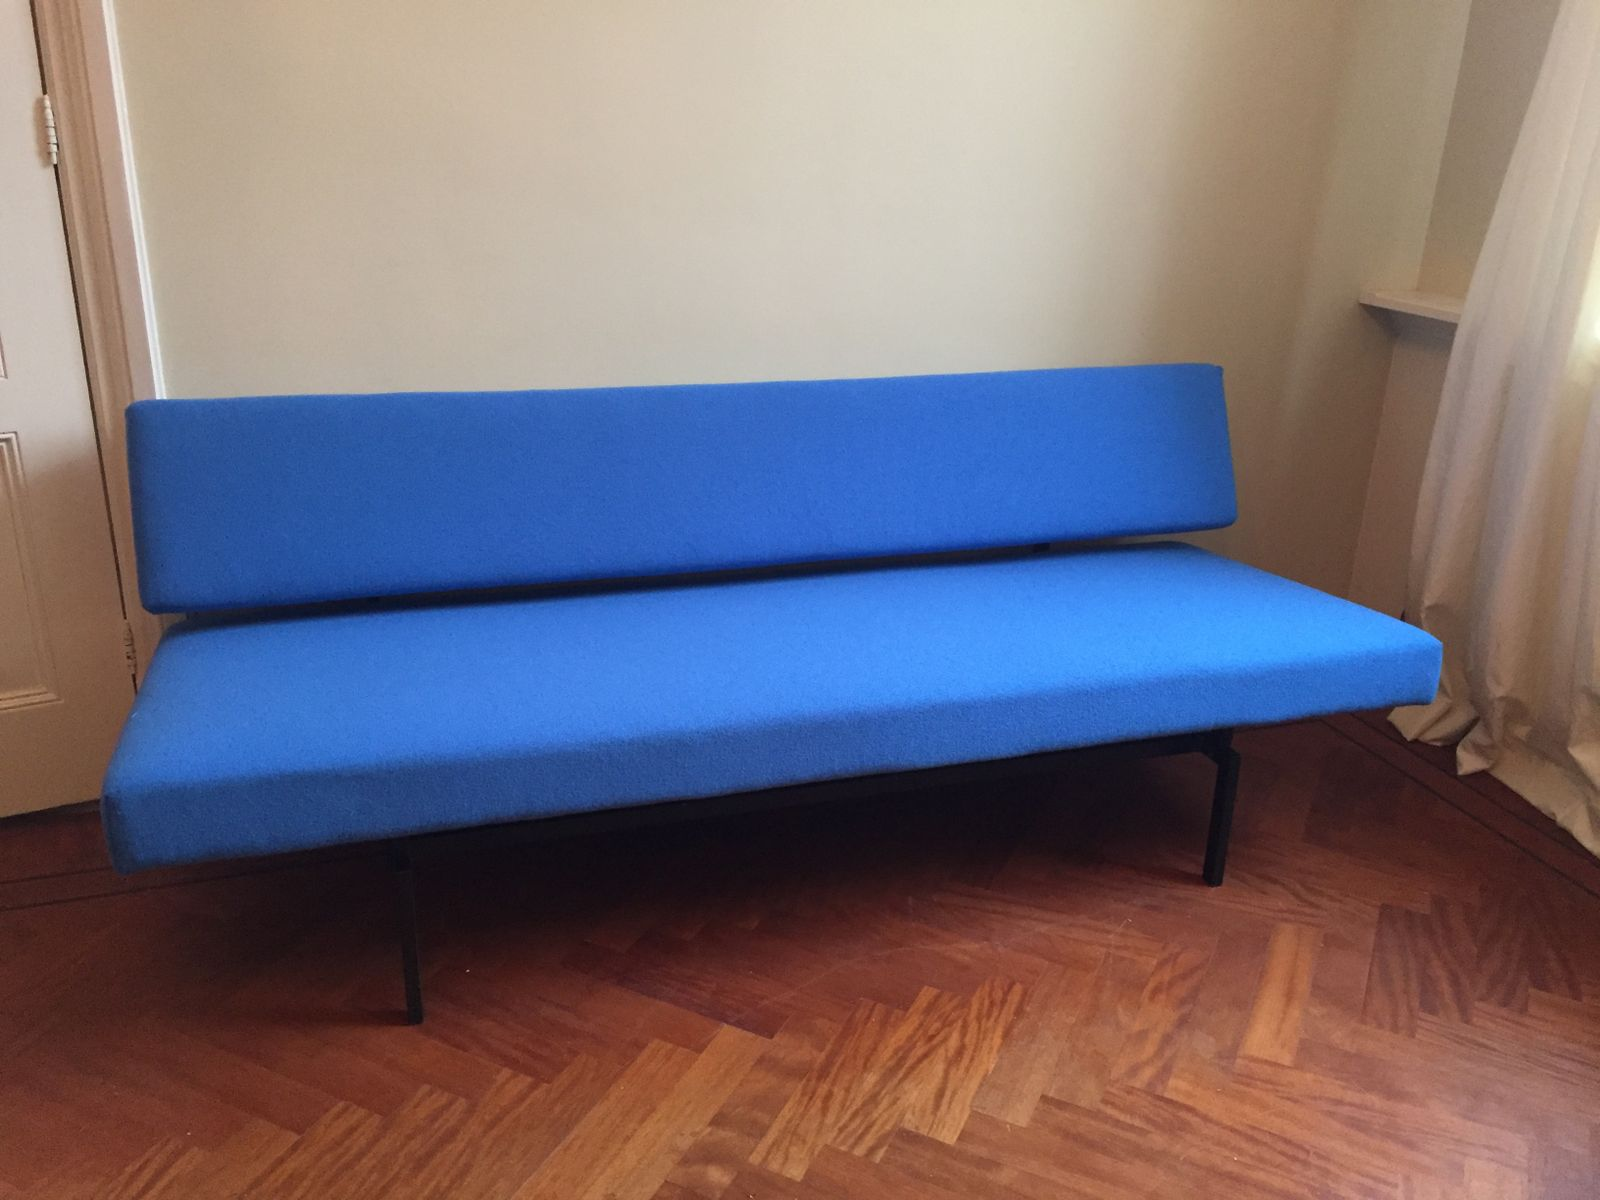 Blue sofa bed by martin visser for 39 t spectrum for sale at for Blue sofas for sale